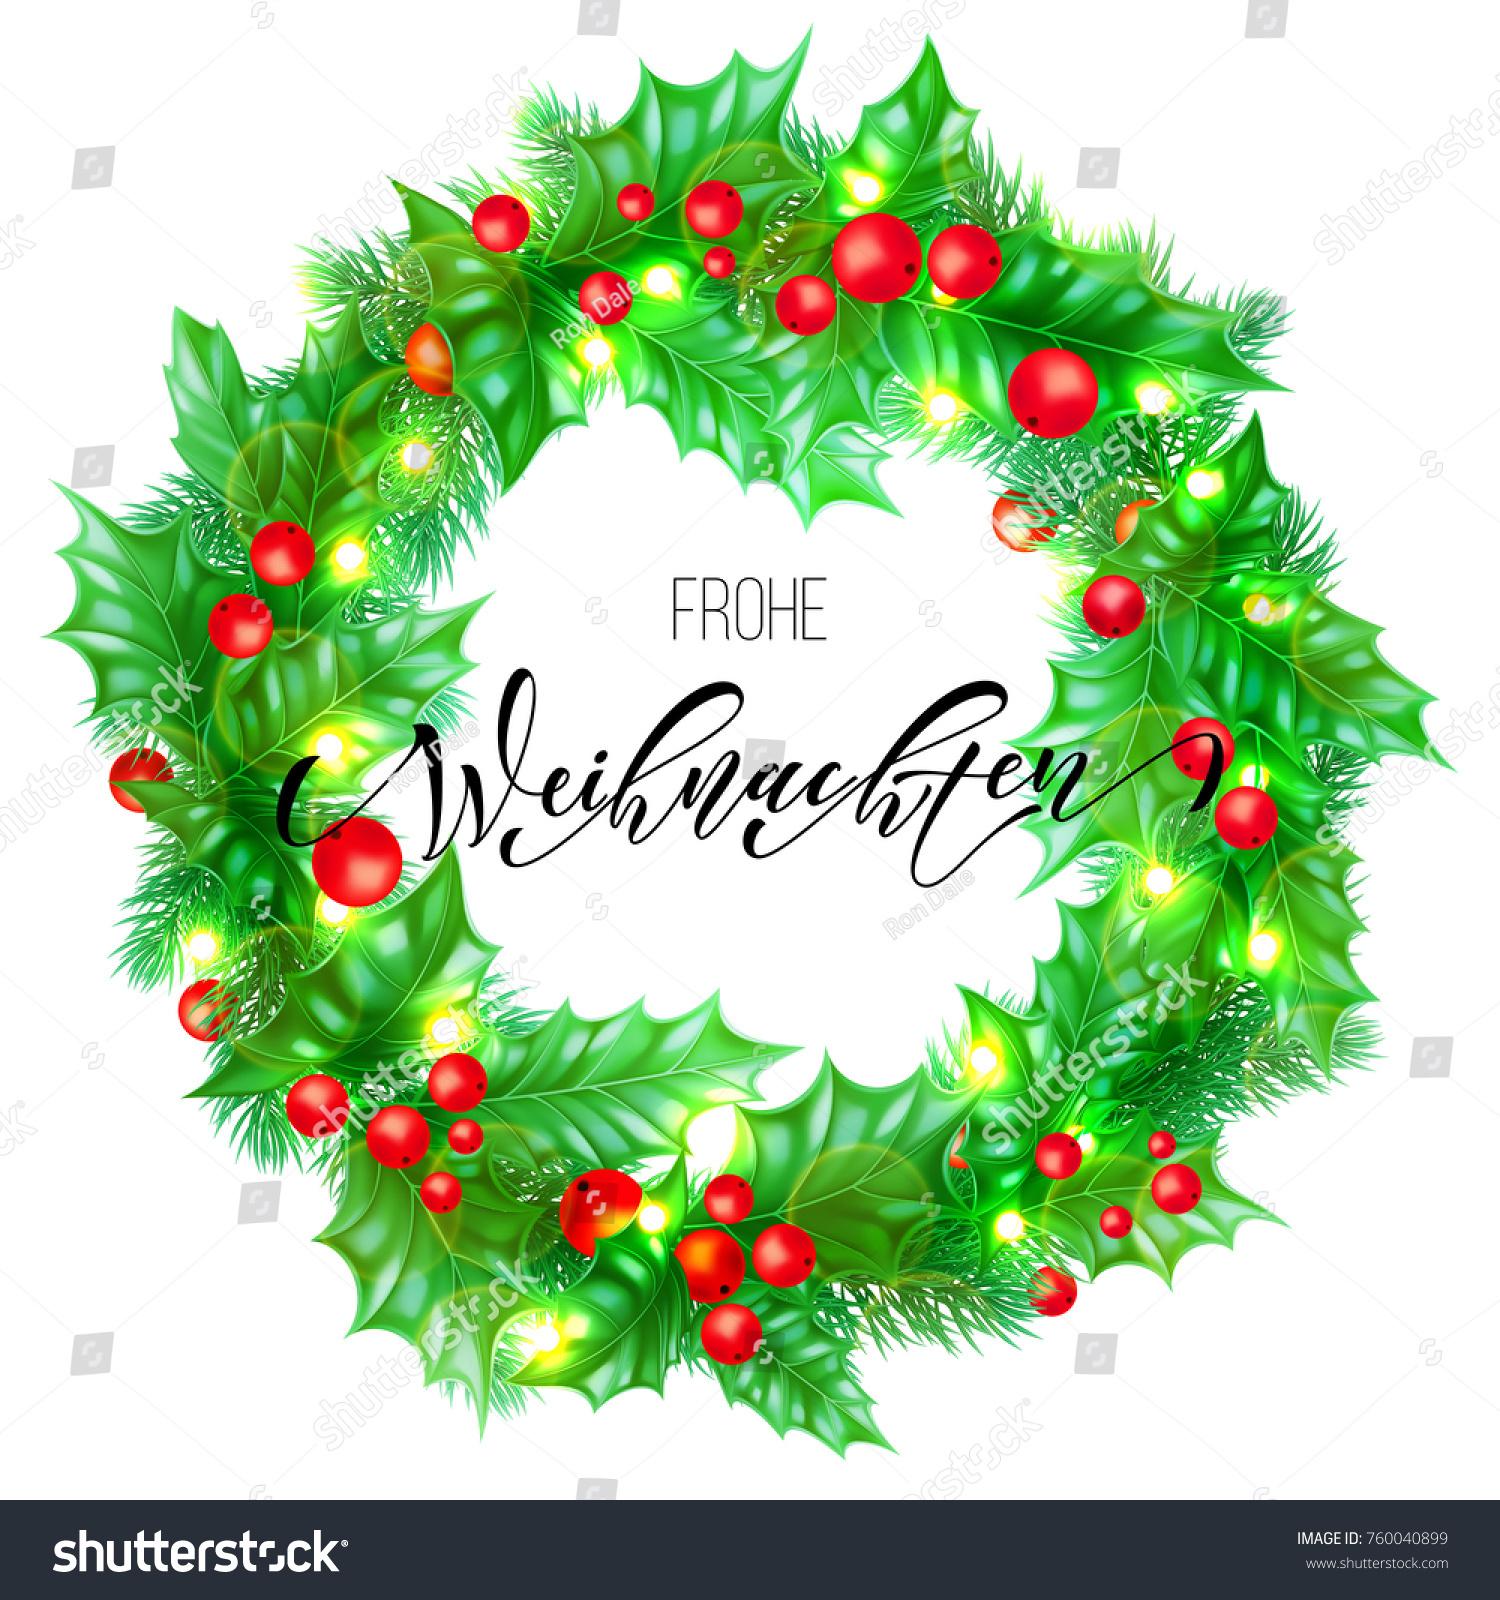 Frohe Weihnachten German Merry Christmas Hand Drawn Quote